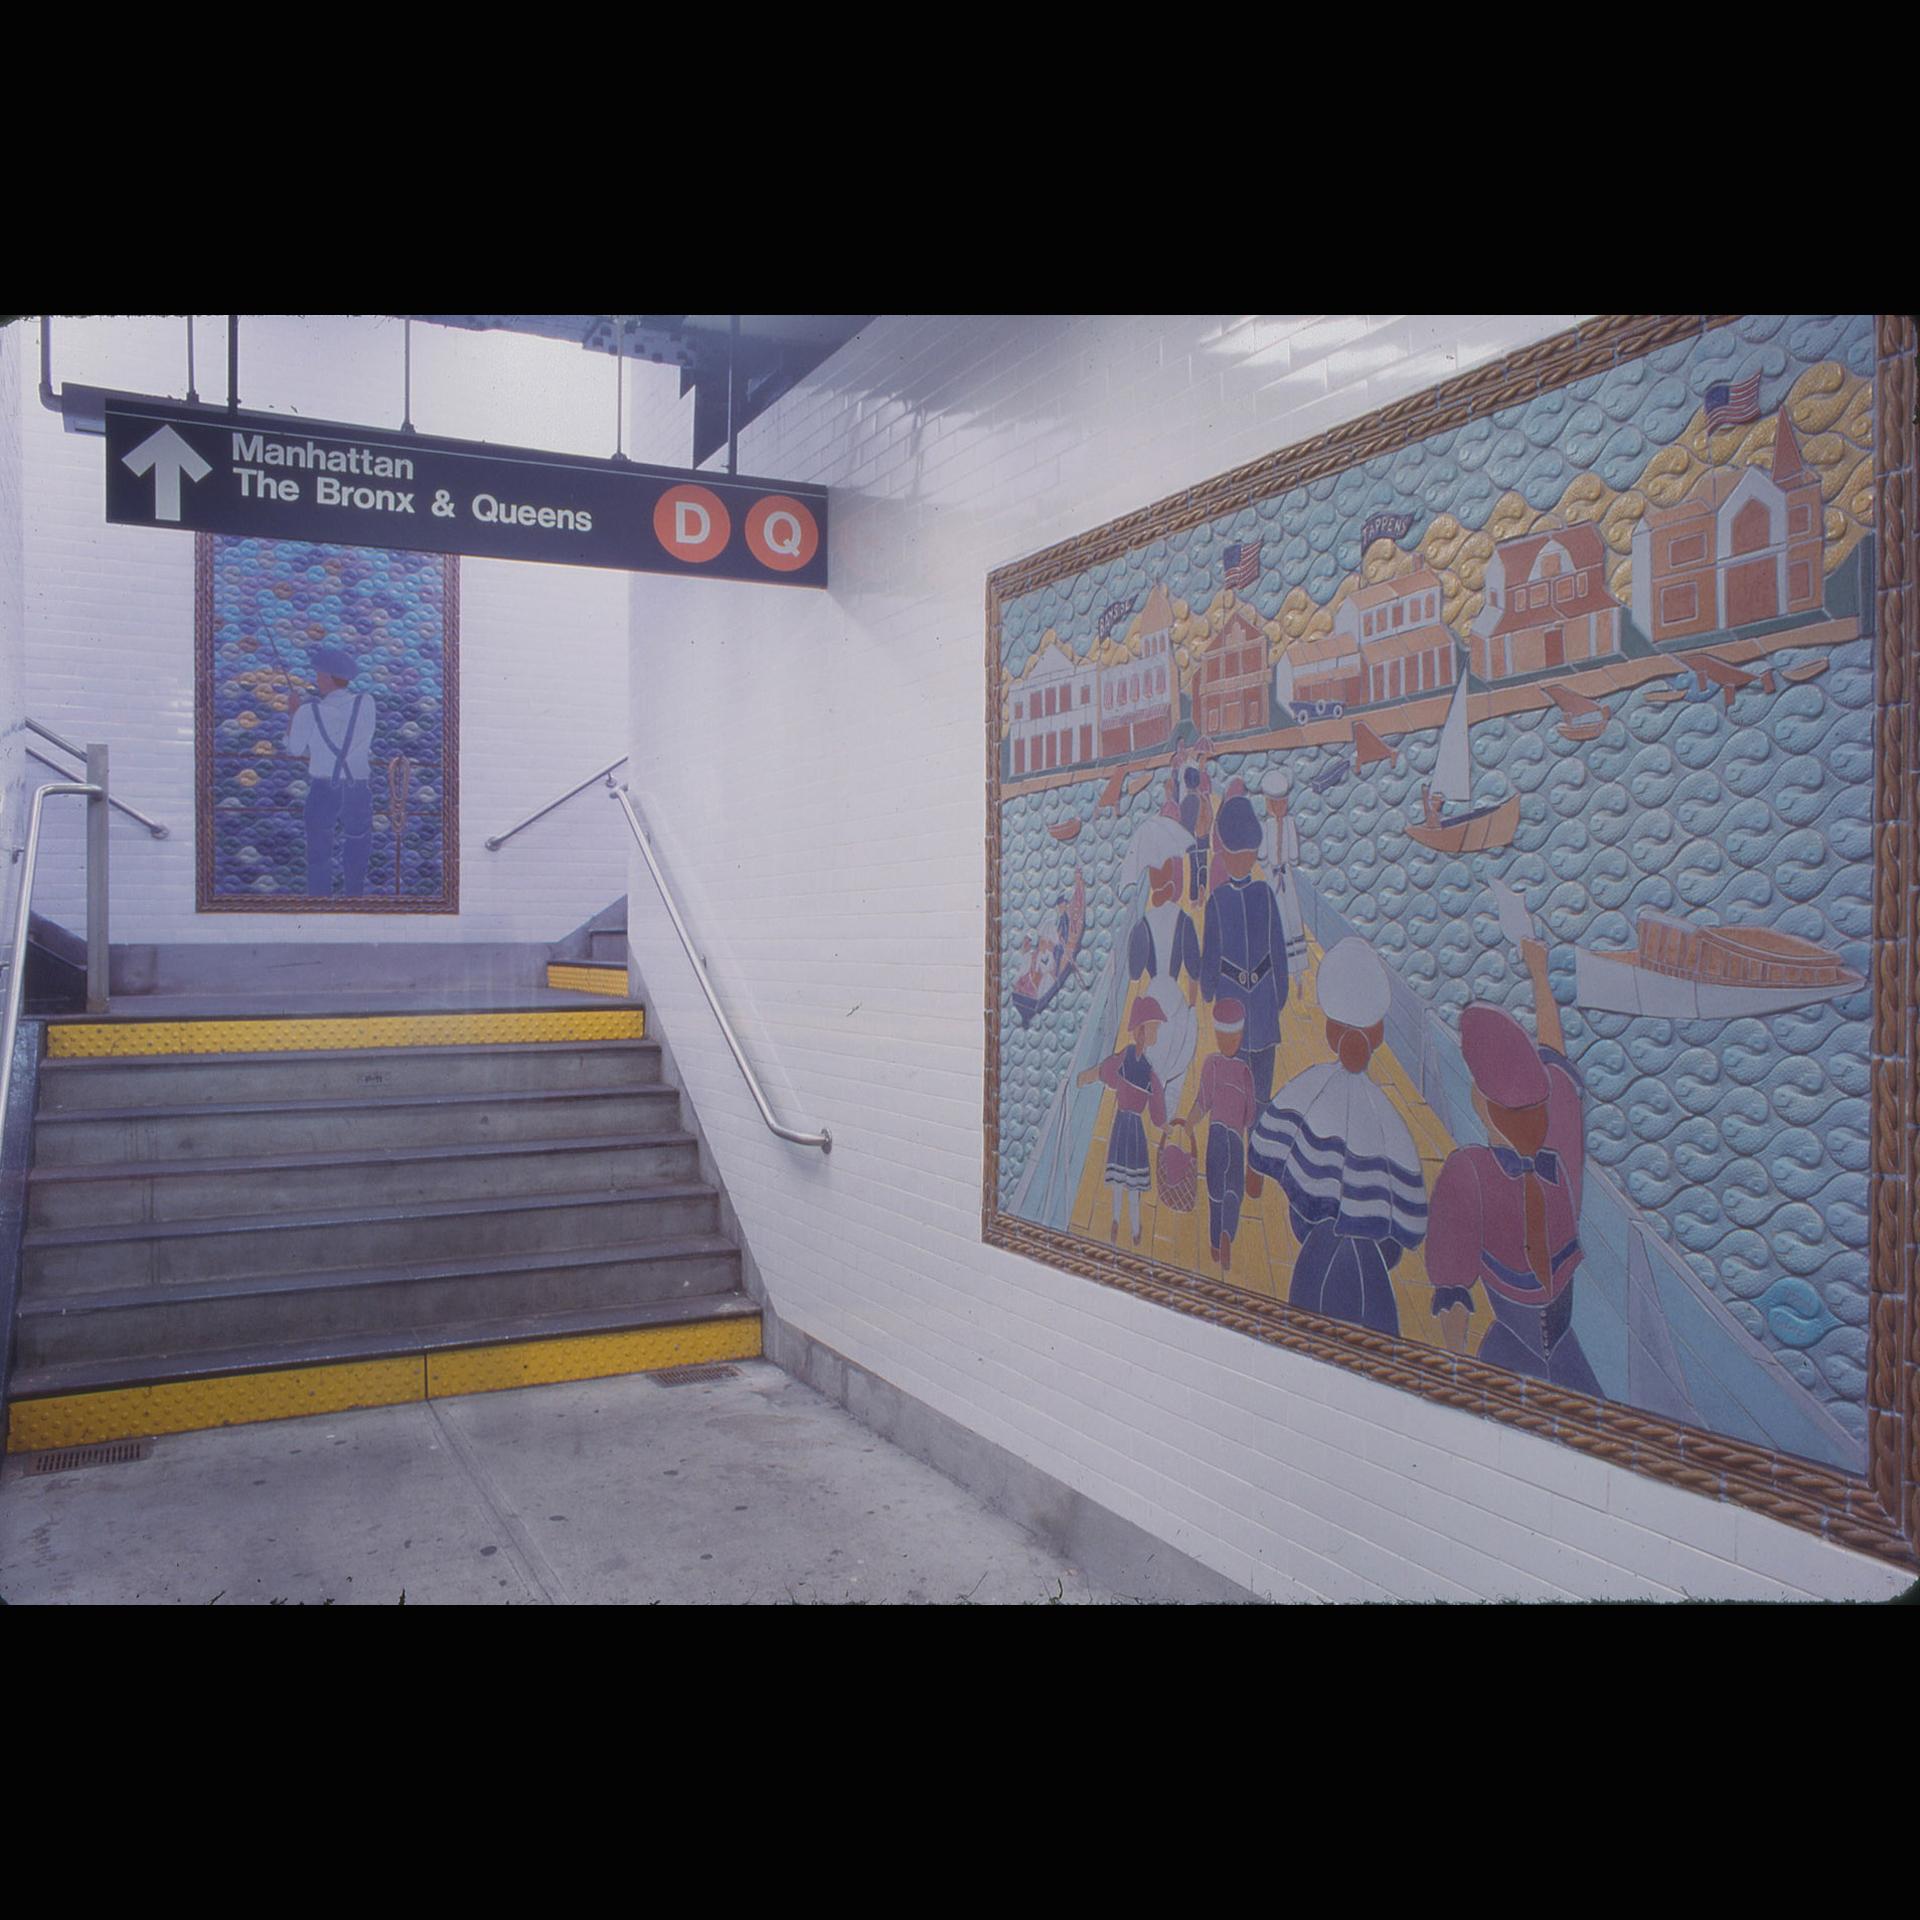 Sheepshead Bay Subway